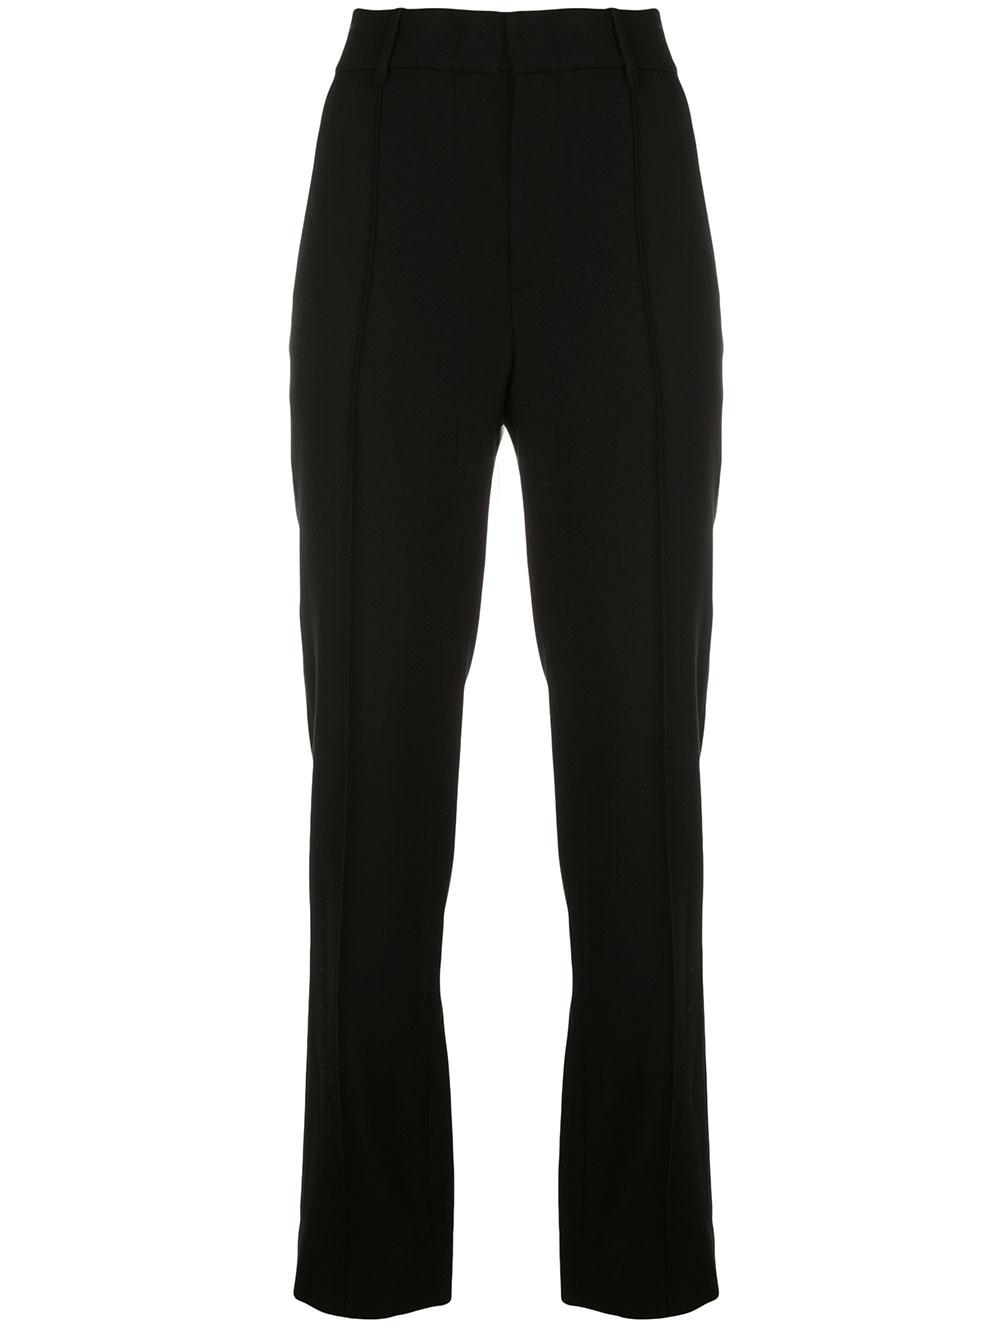 High waist Tailored Pant